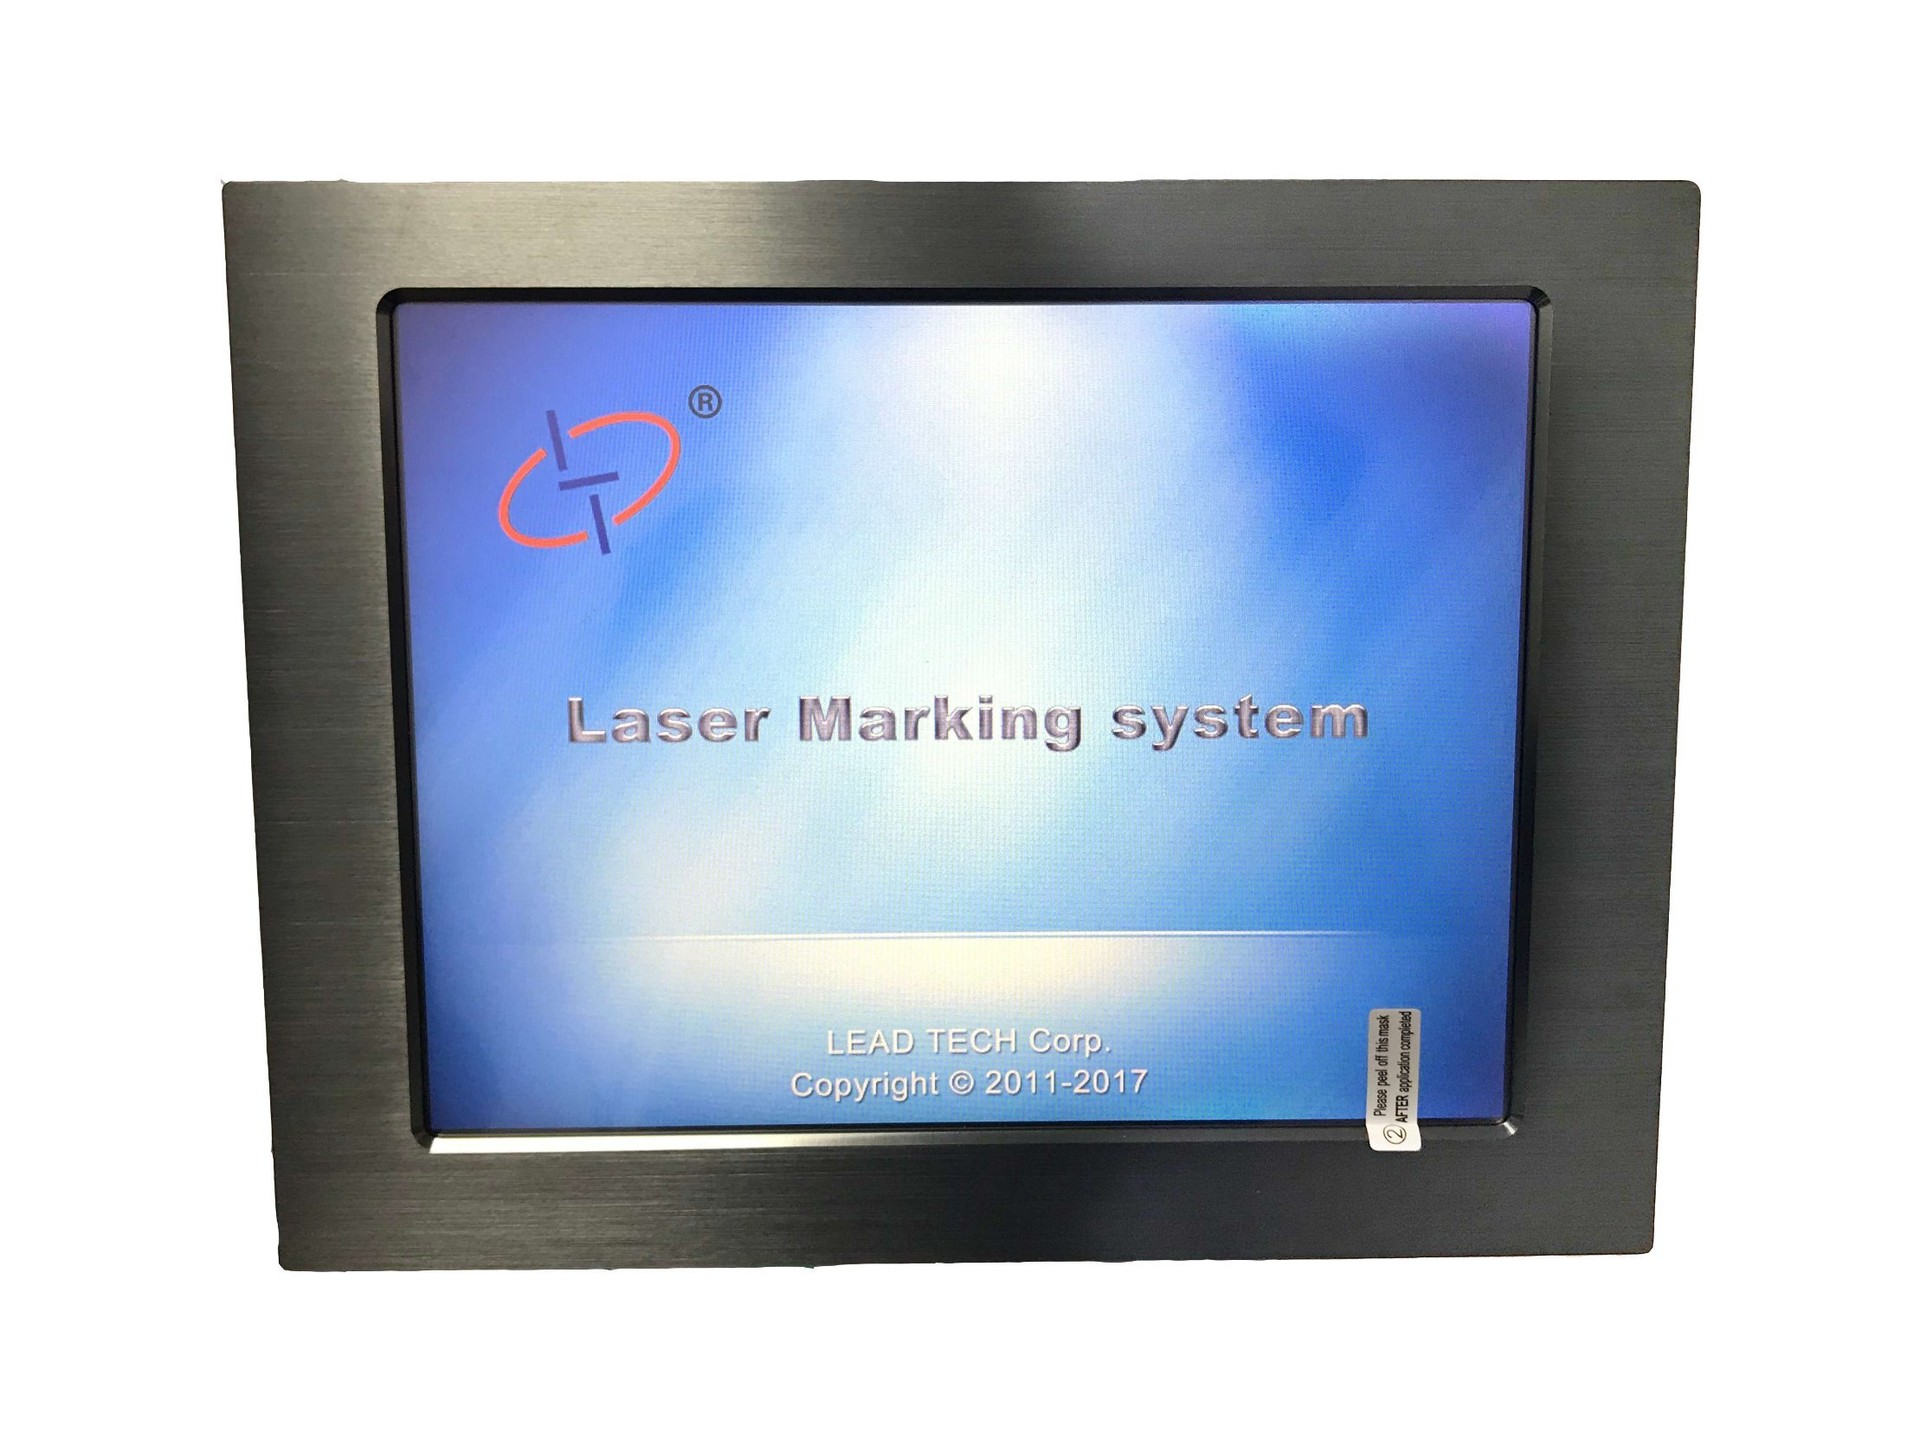 Lead Tech Lt8003u/Lt8005u UV 3W/5W High Precision Laser Printer for Stainless Steel Printing